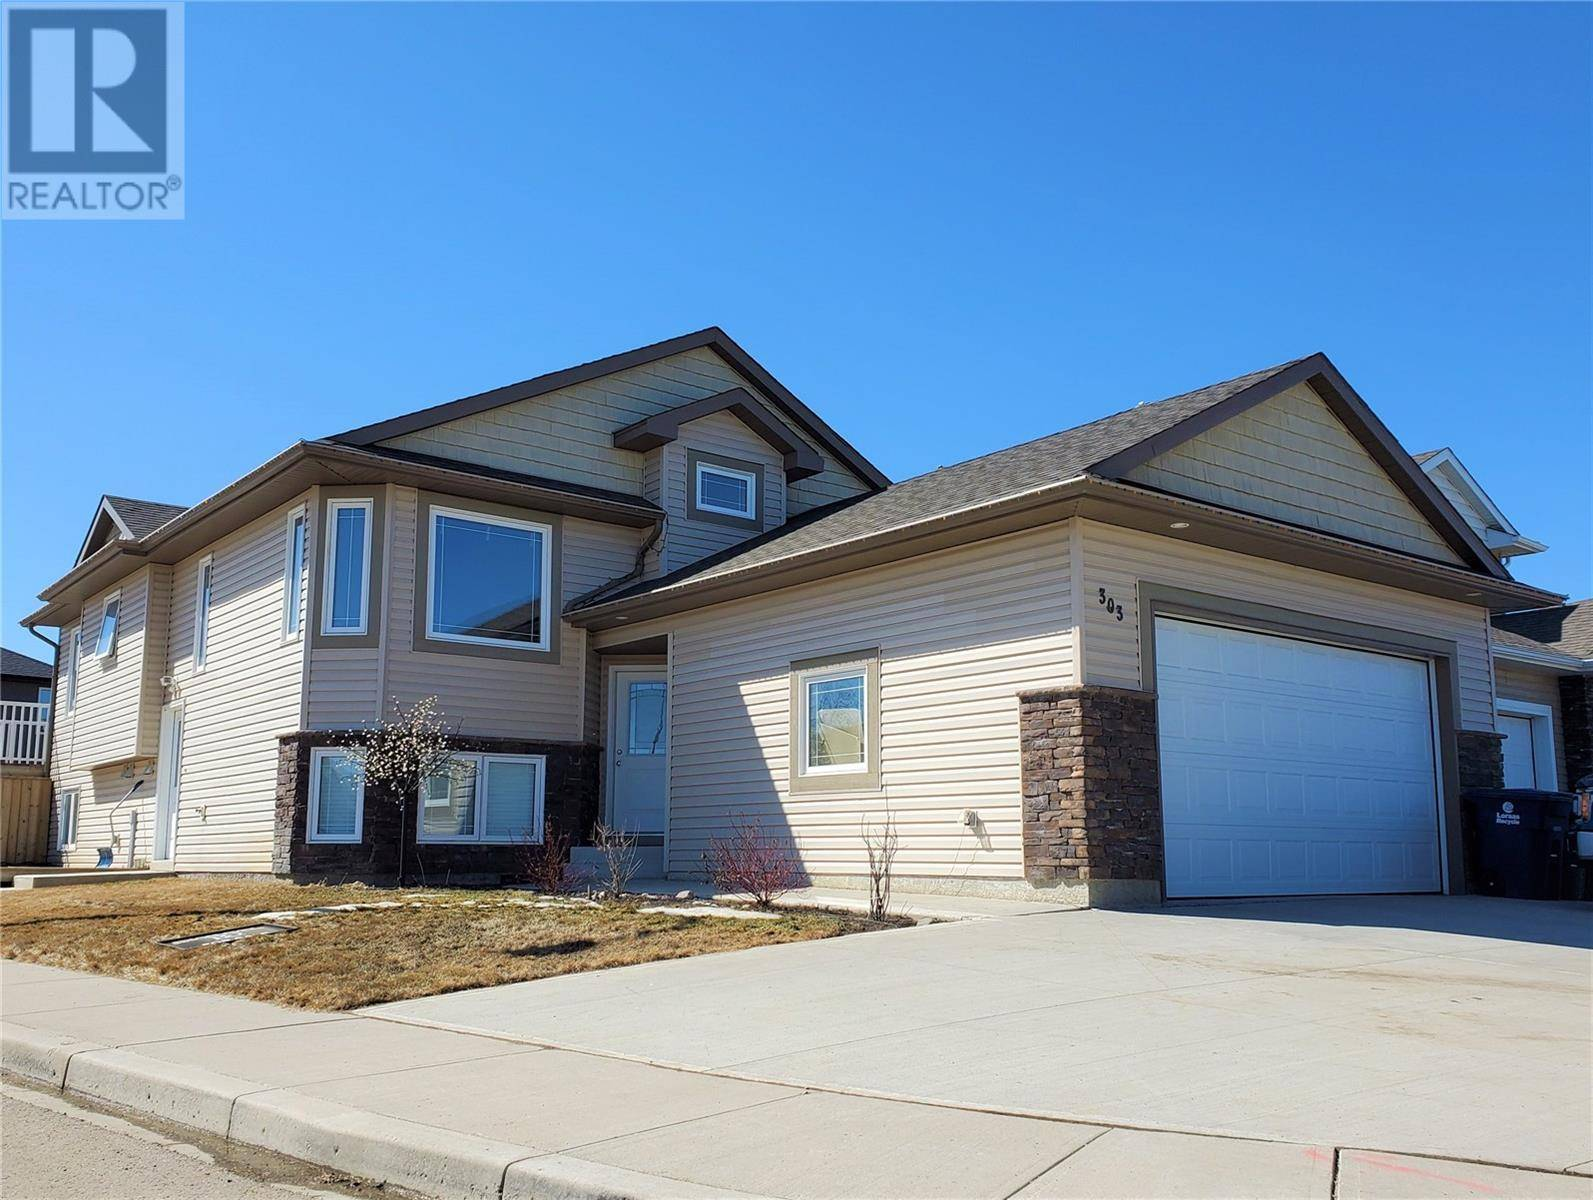 House for sale at 303 Lehrer Mnr  Saskatoon Saskatchewan - MLS: SK804370